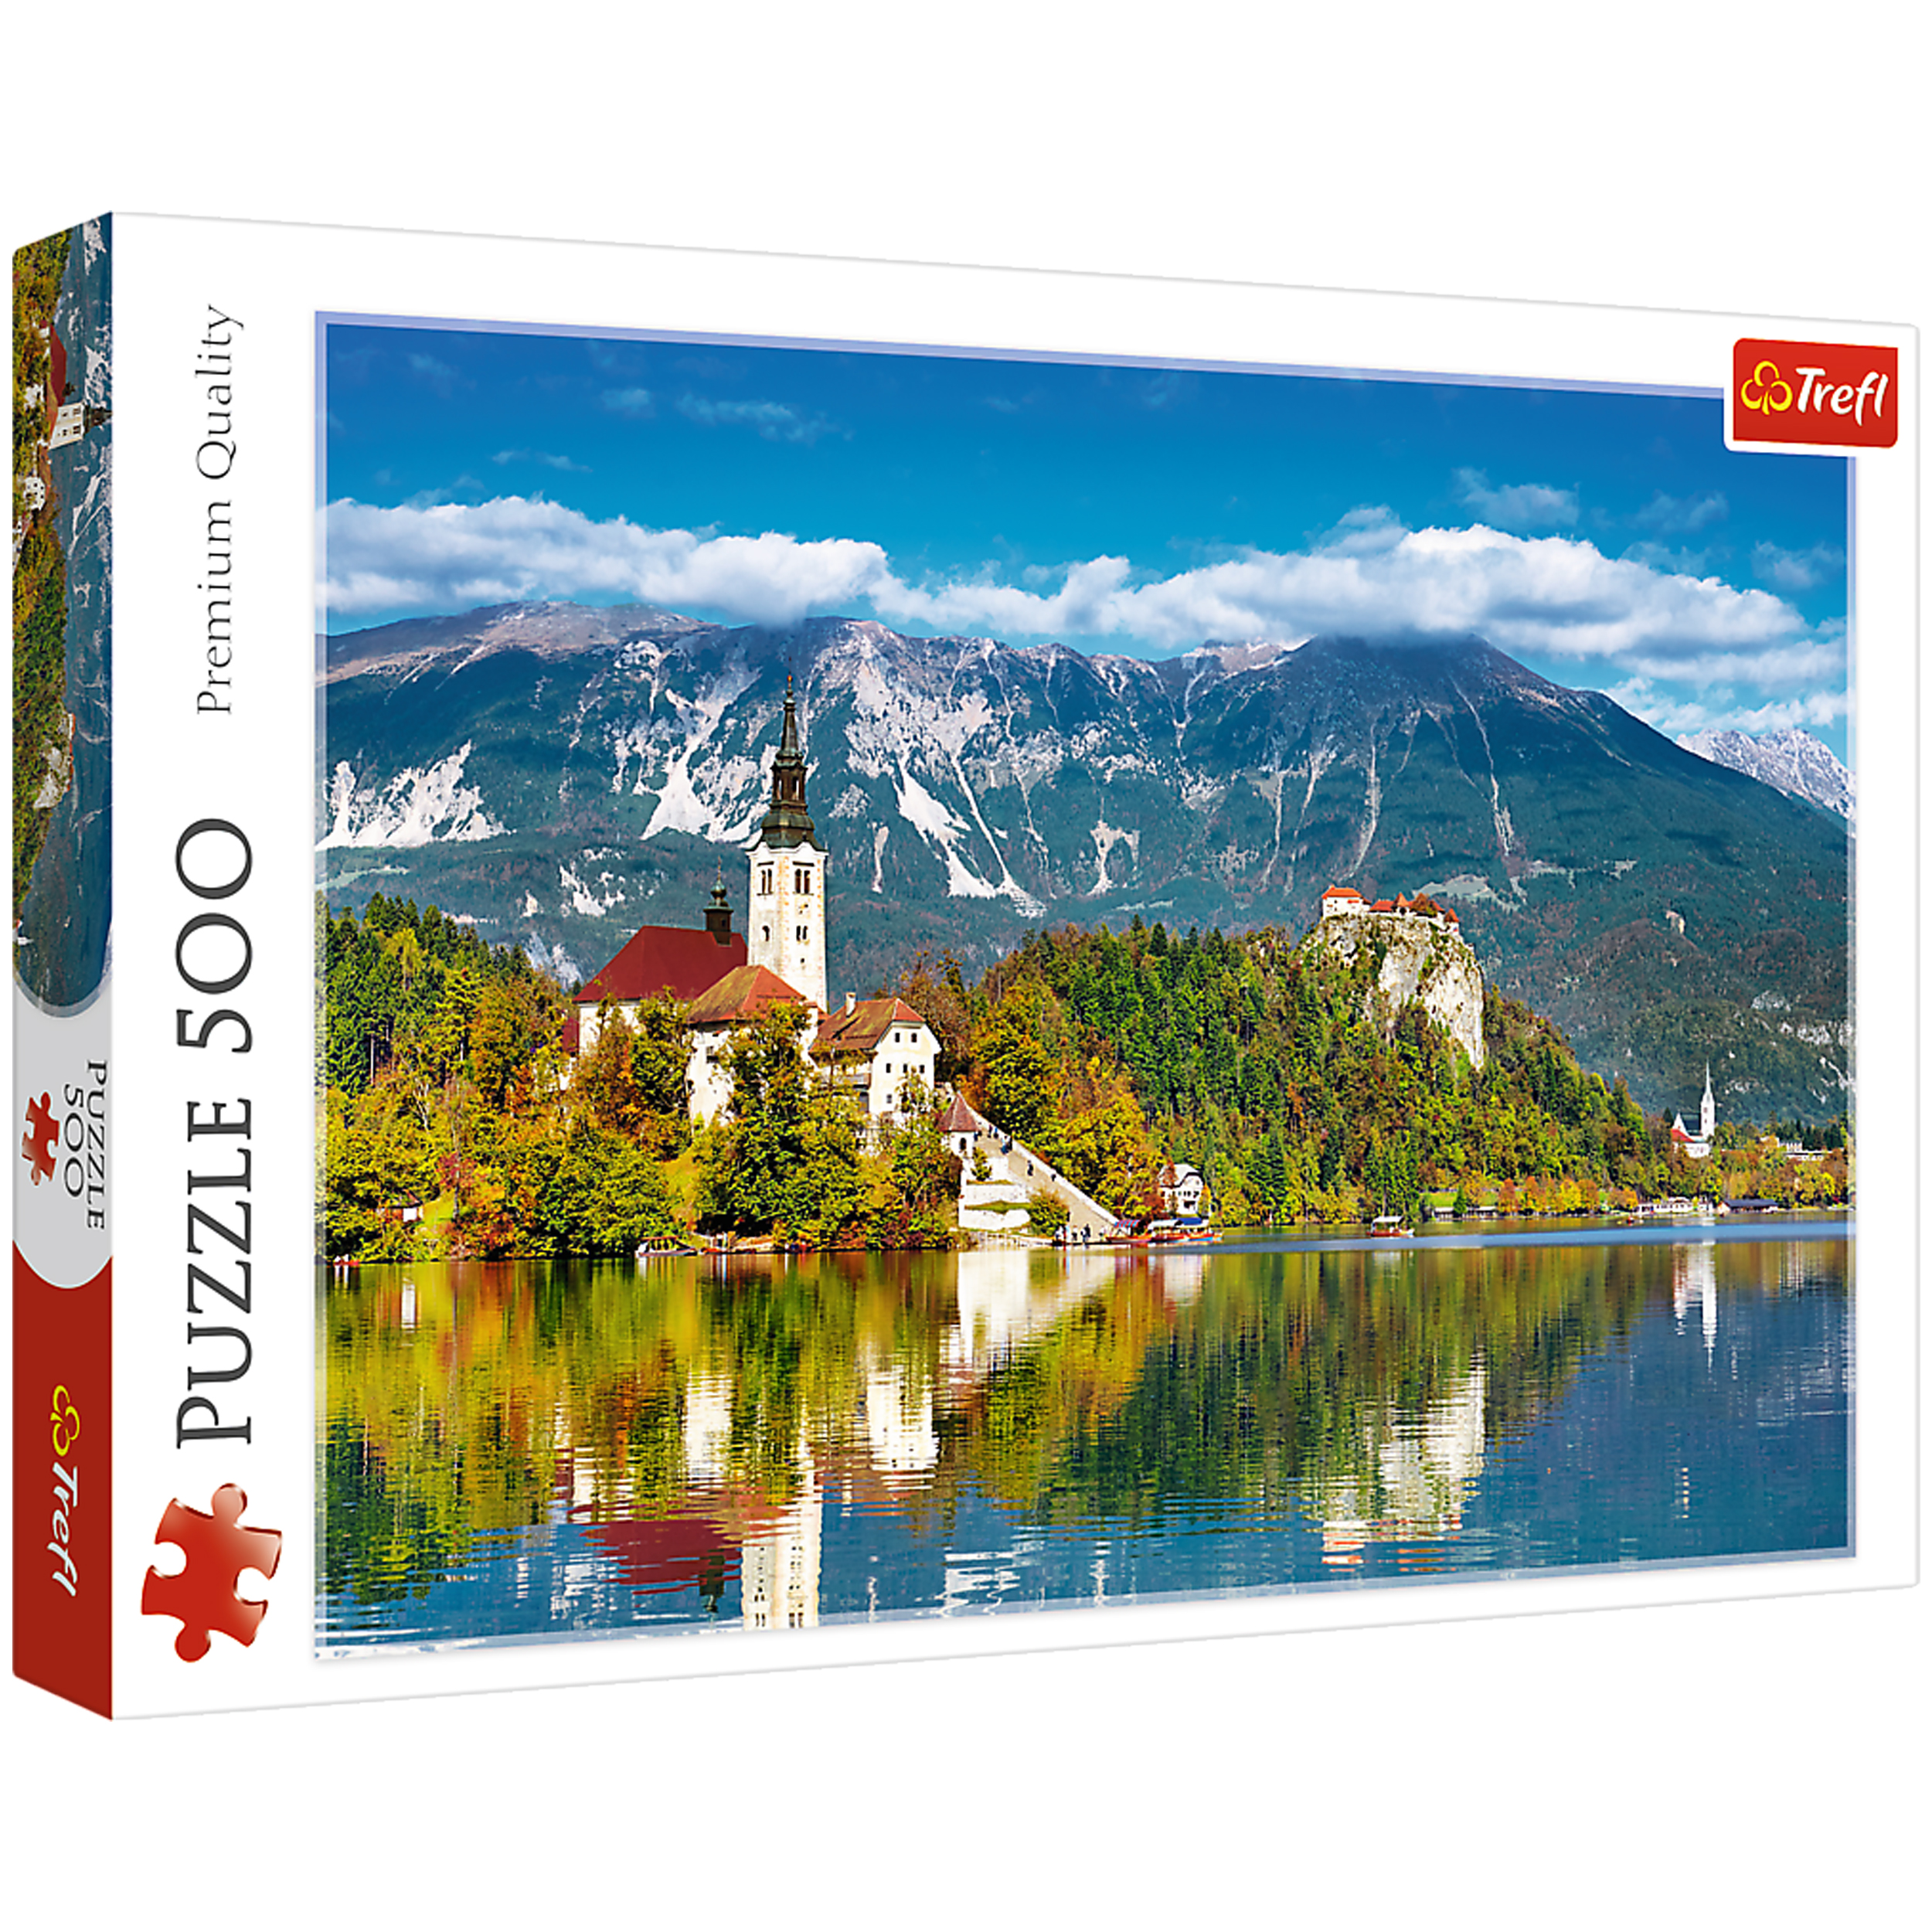 پازل 500 تکه تریفل مدل Bled Slovenia